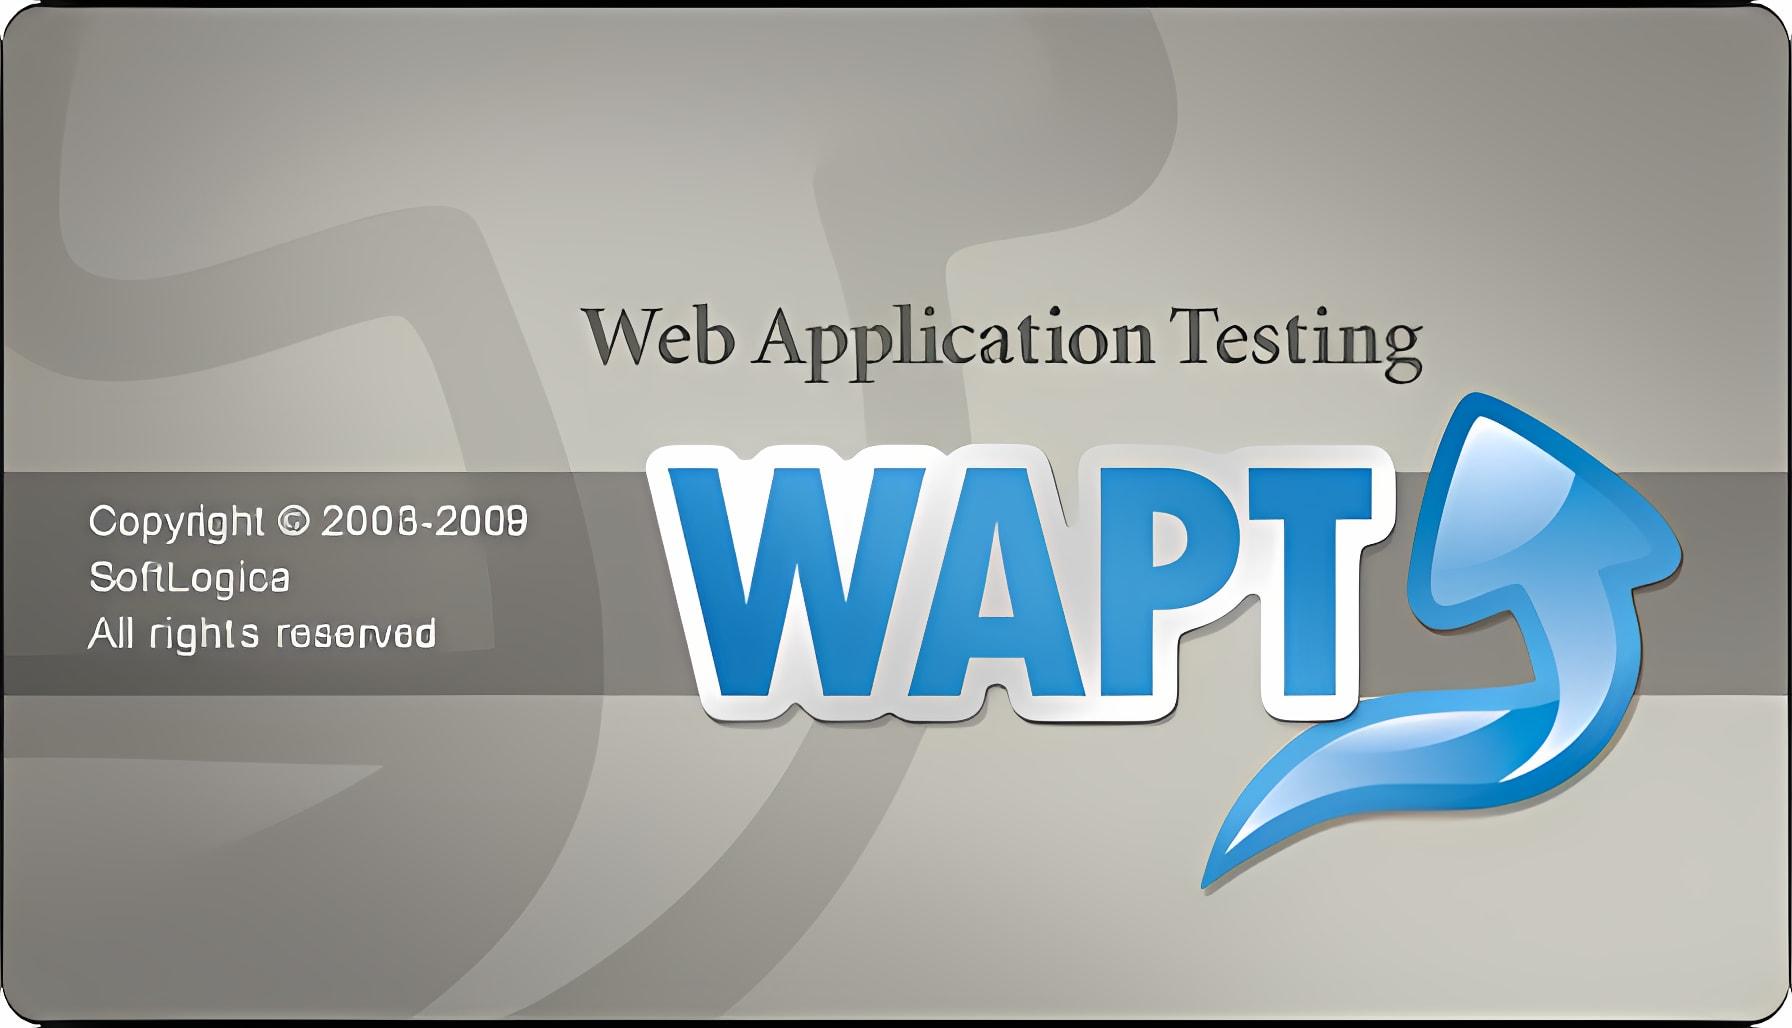 WAPT 6.0